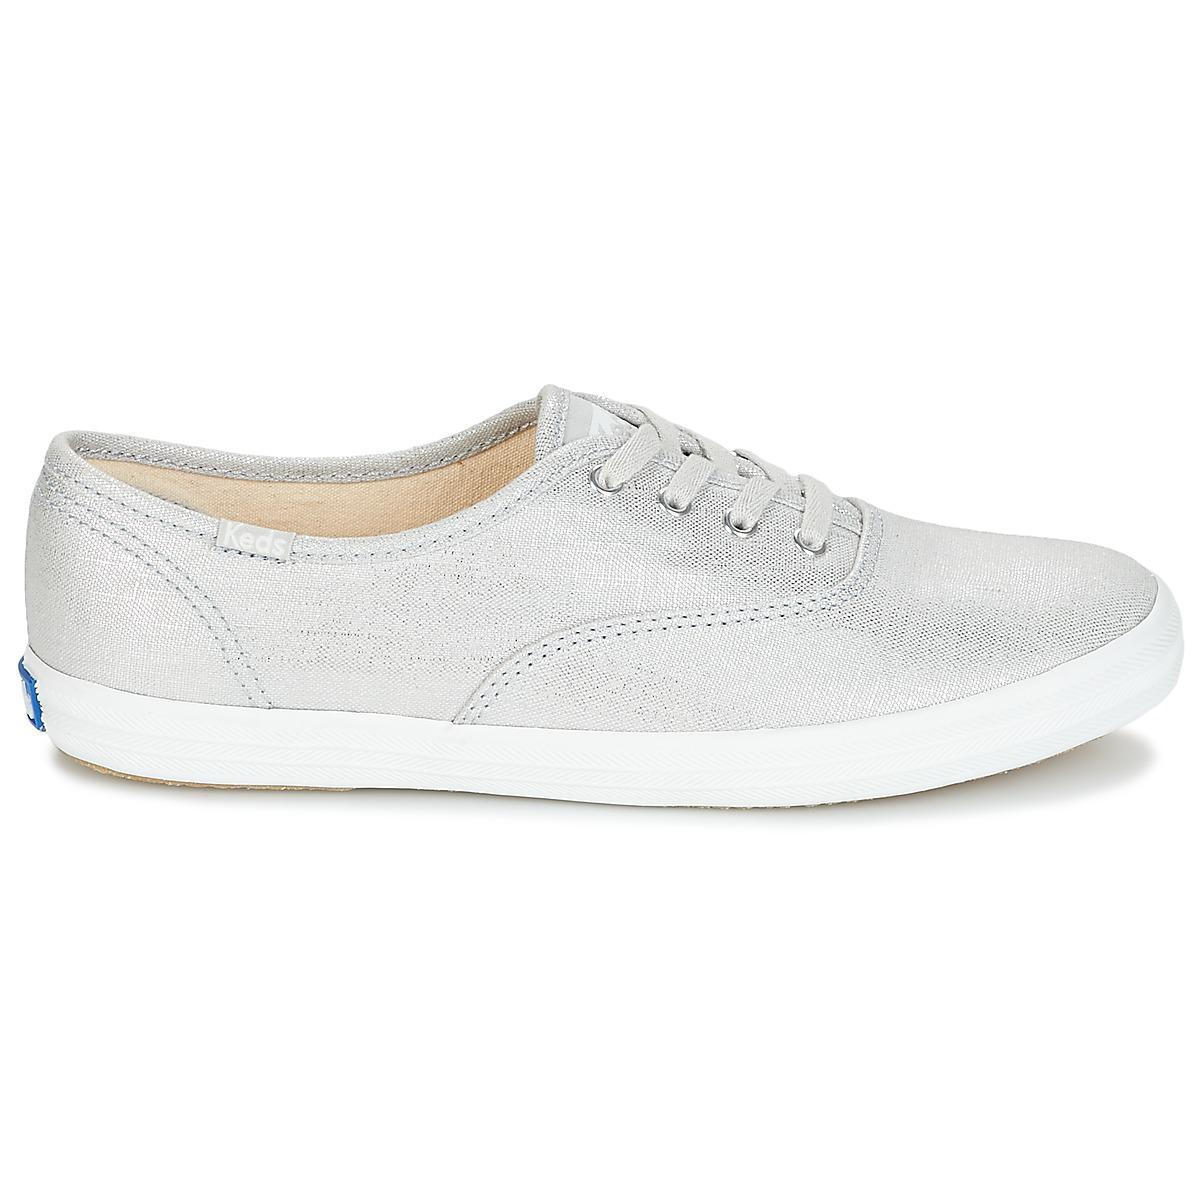 56853c7432d11 Keds Champion Metallic Linen Shoes (trainers) in Metallic - Lyst